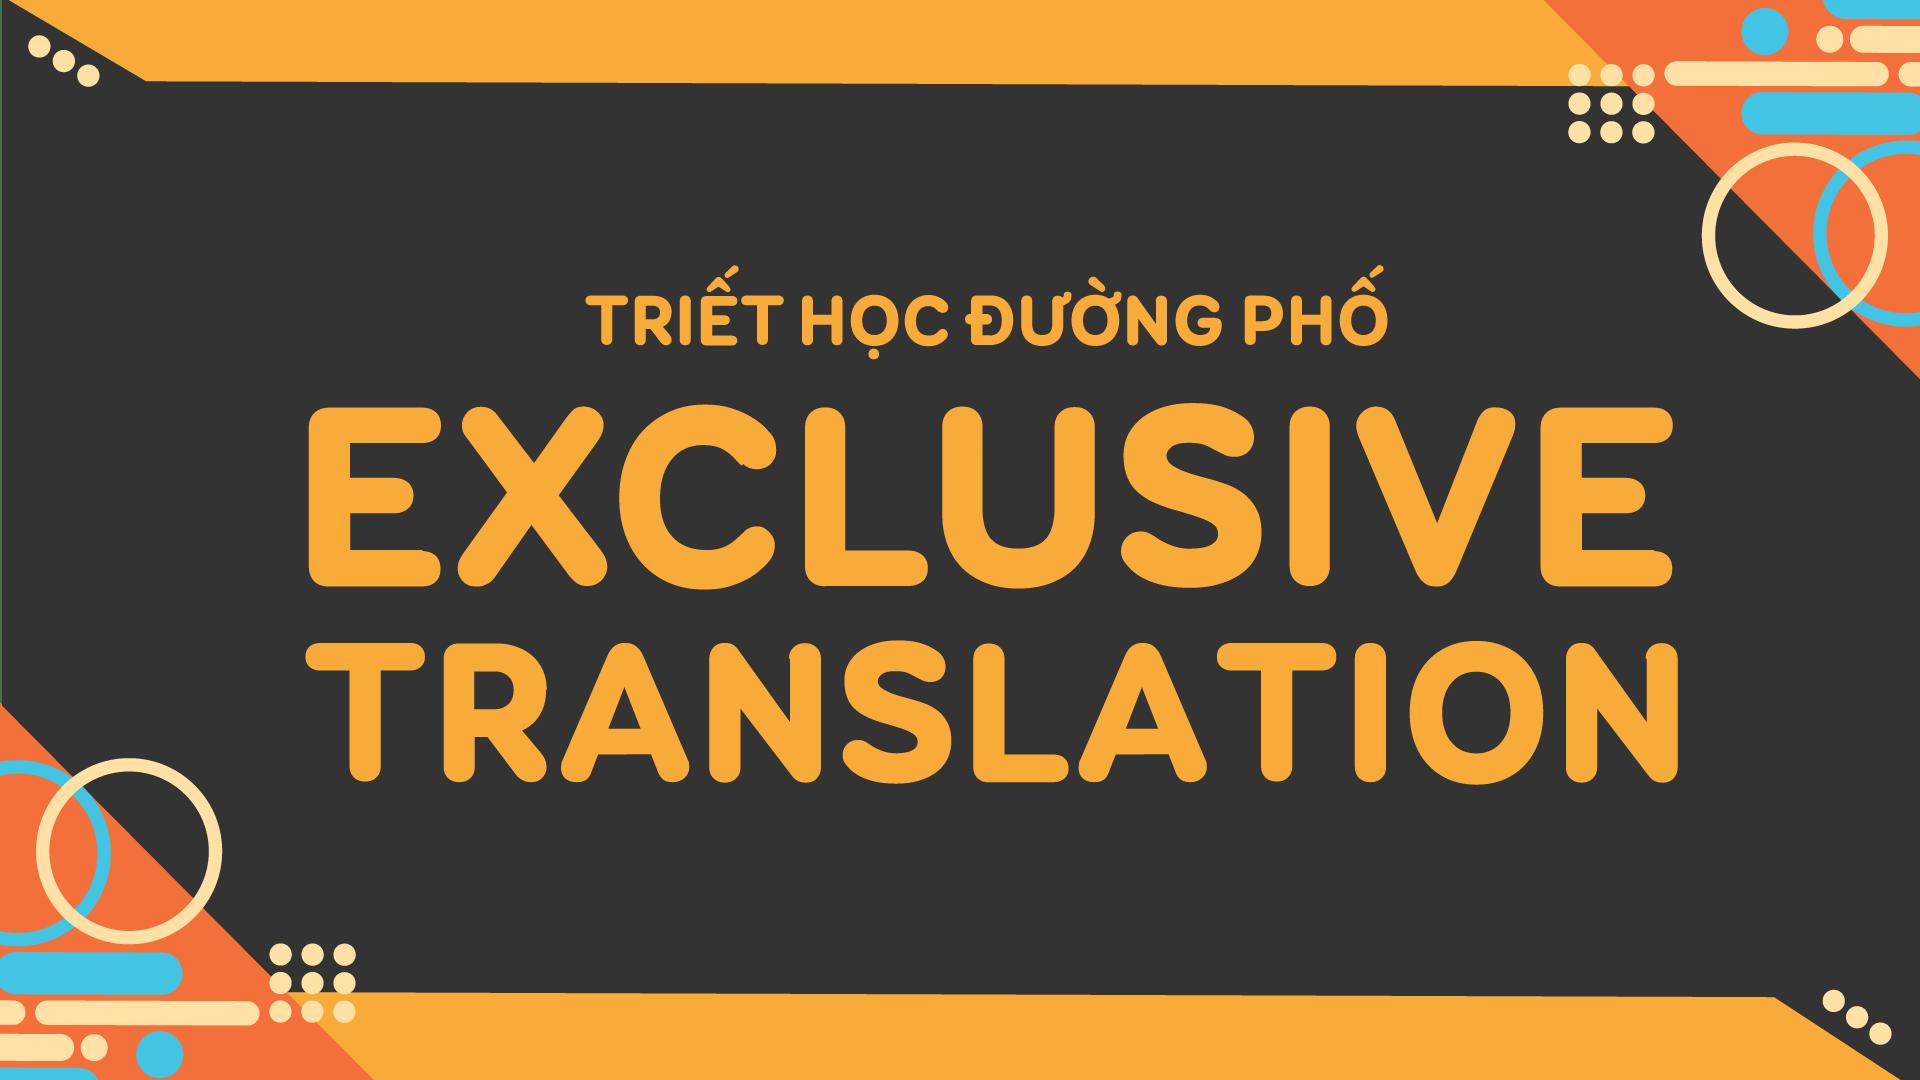 thdp translation 4